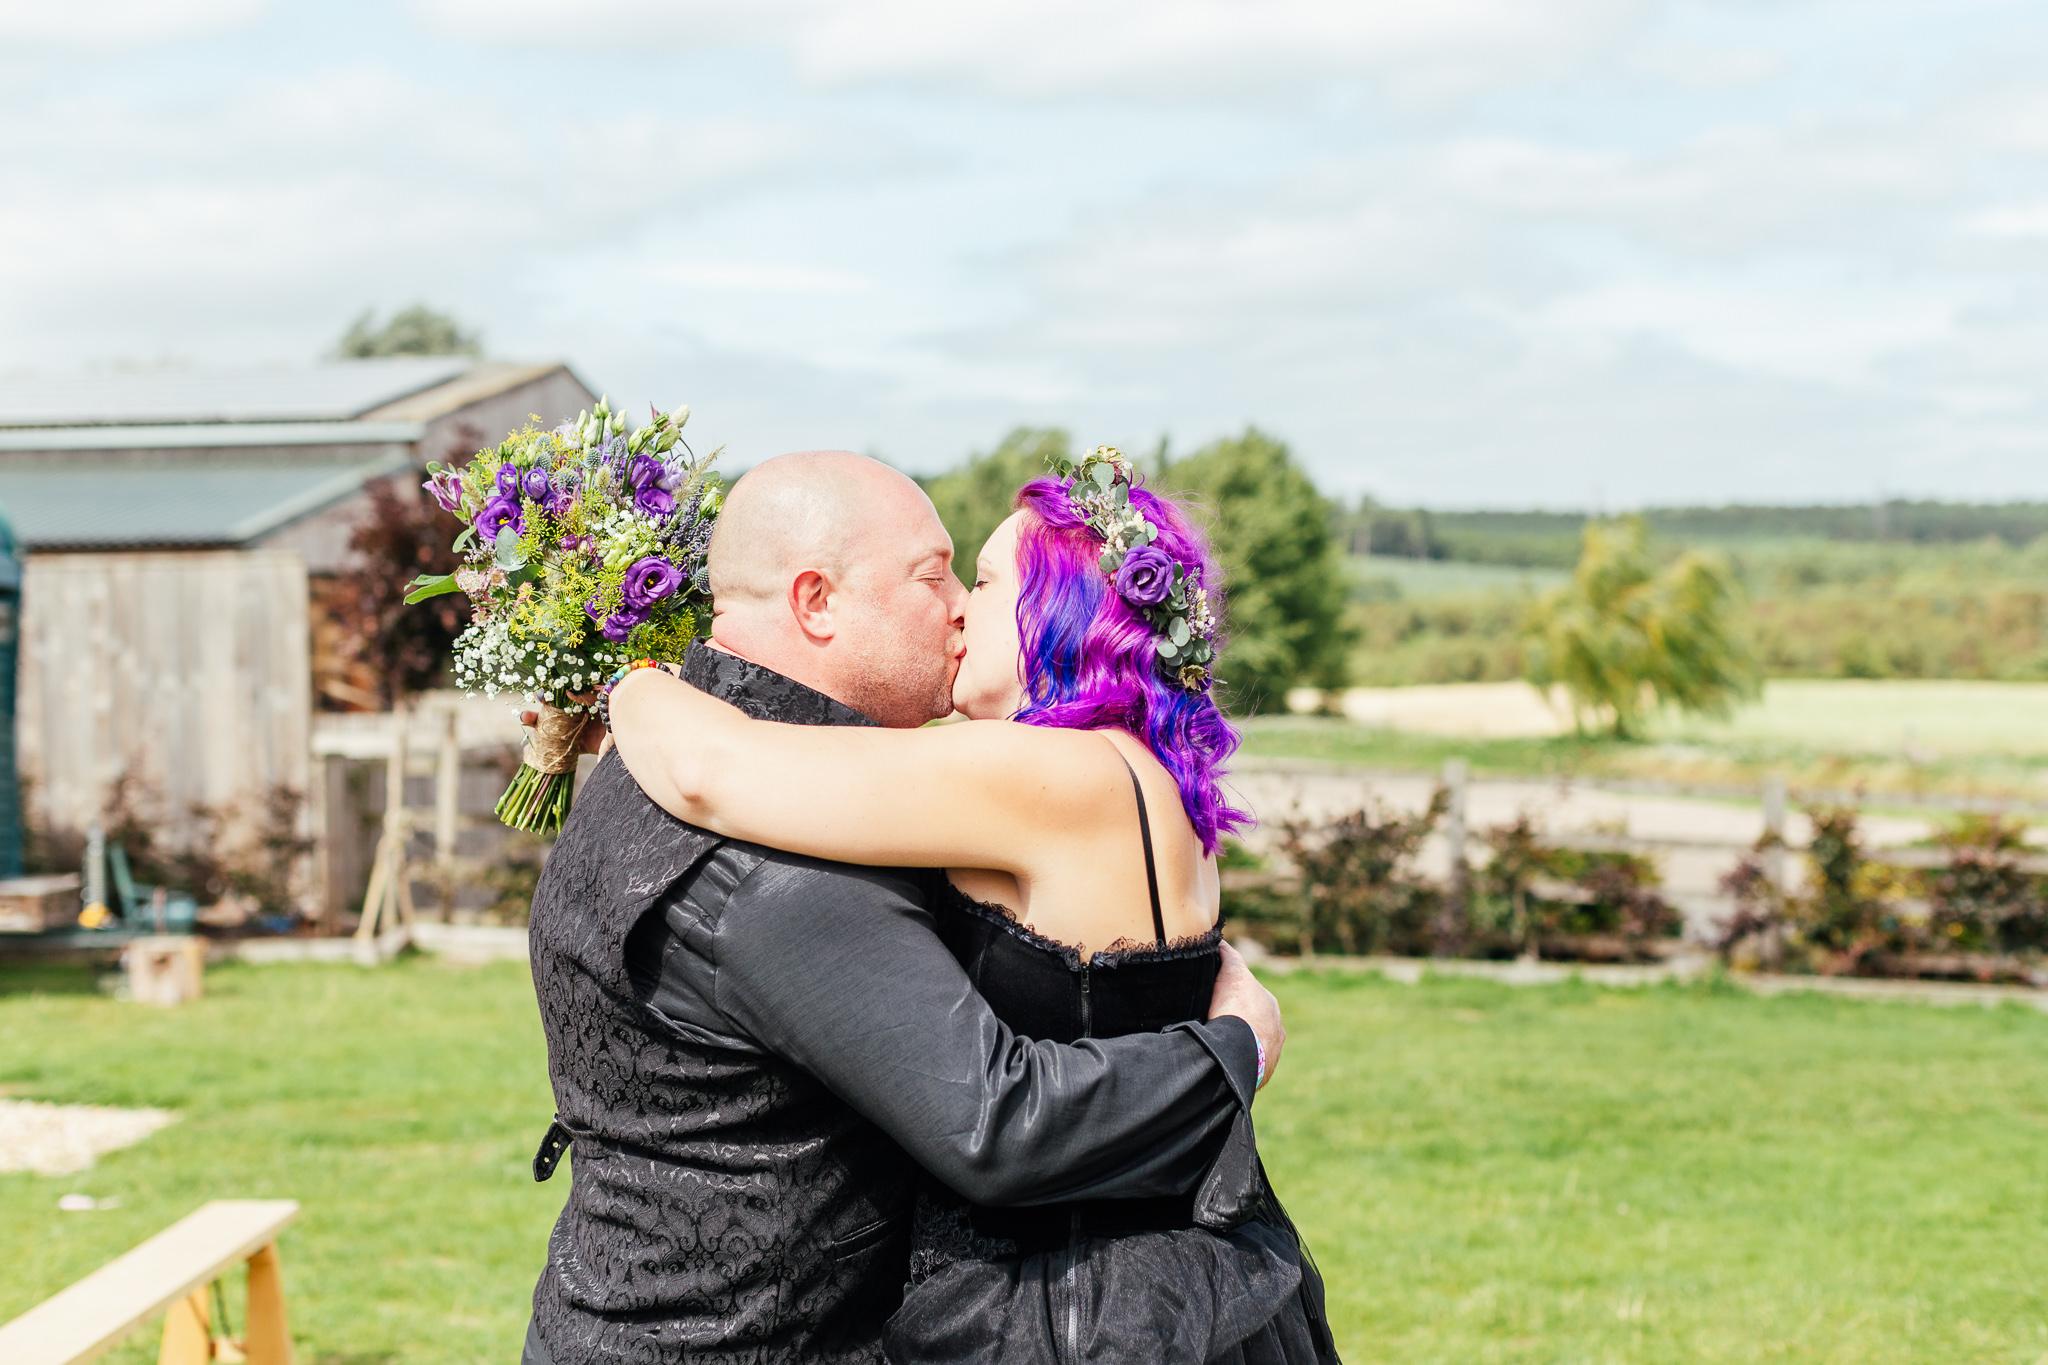 Inkersall-grange-farm-wedding-23.jpg